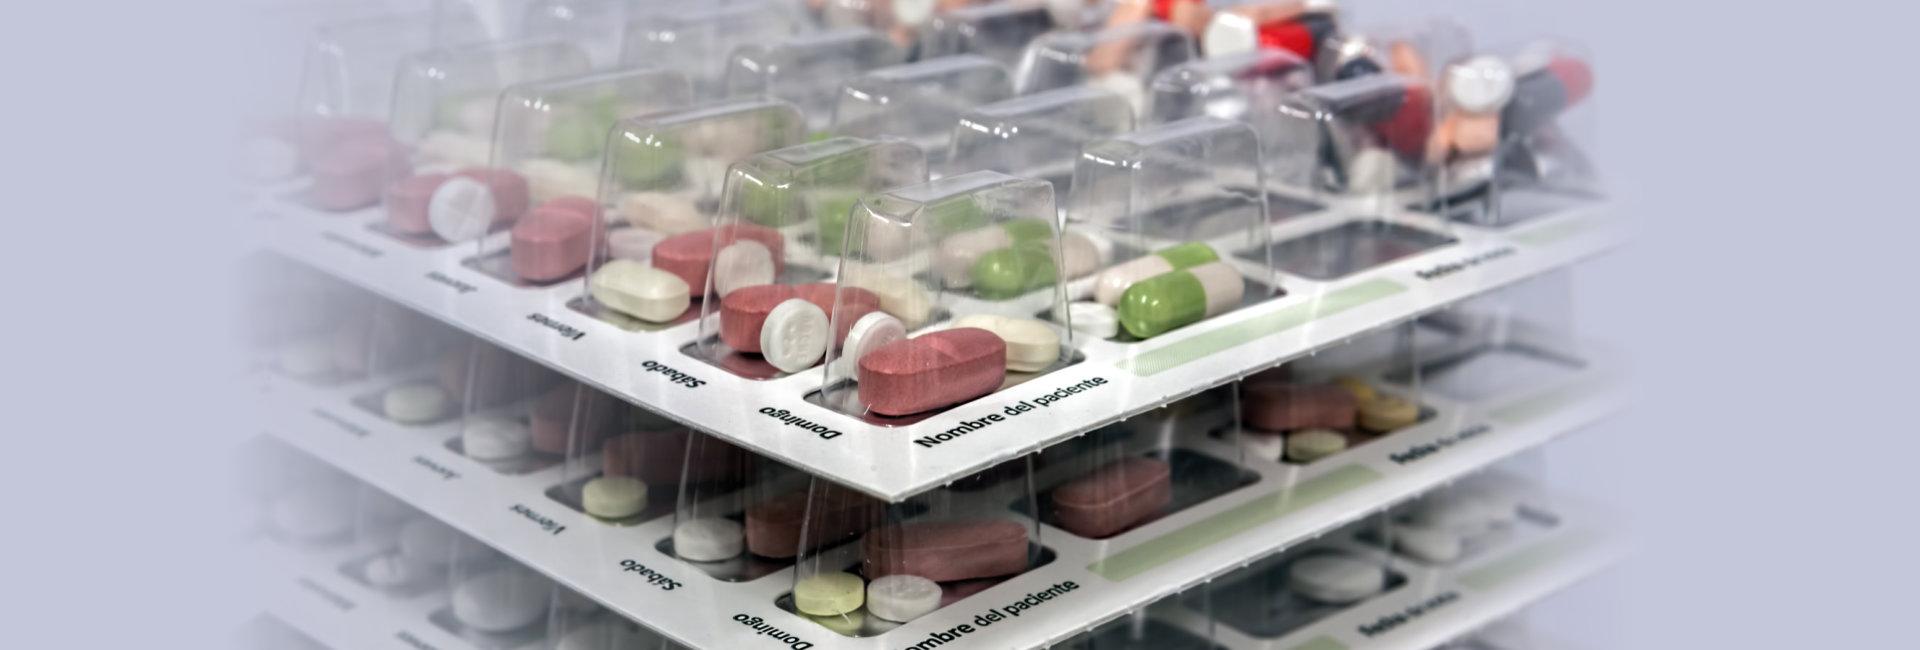 Pills with pill organizer